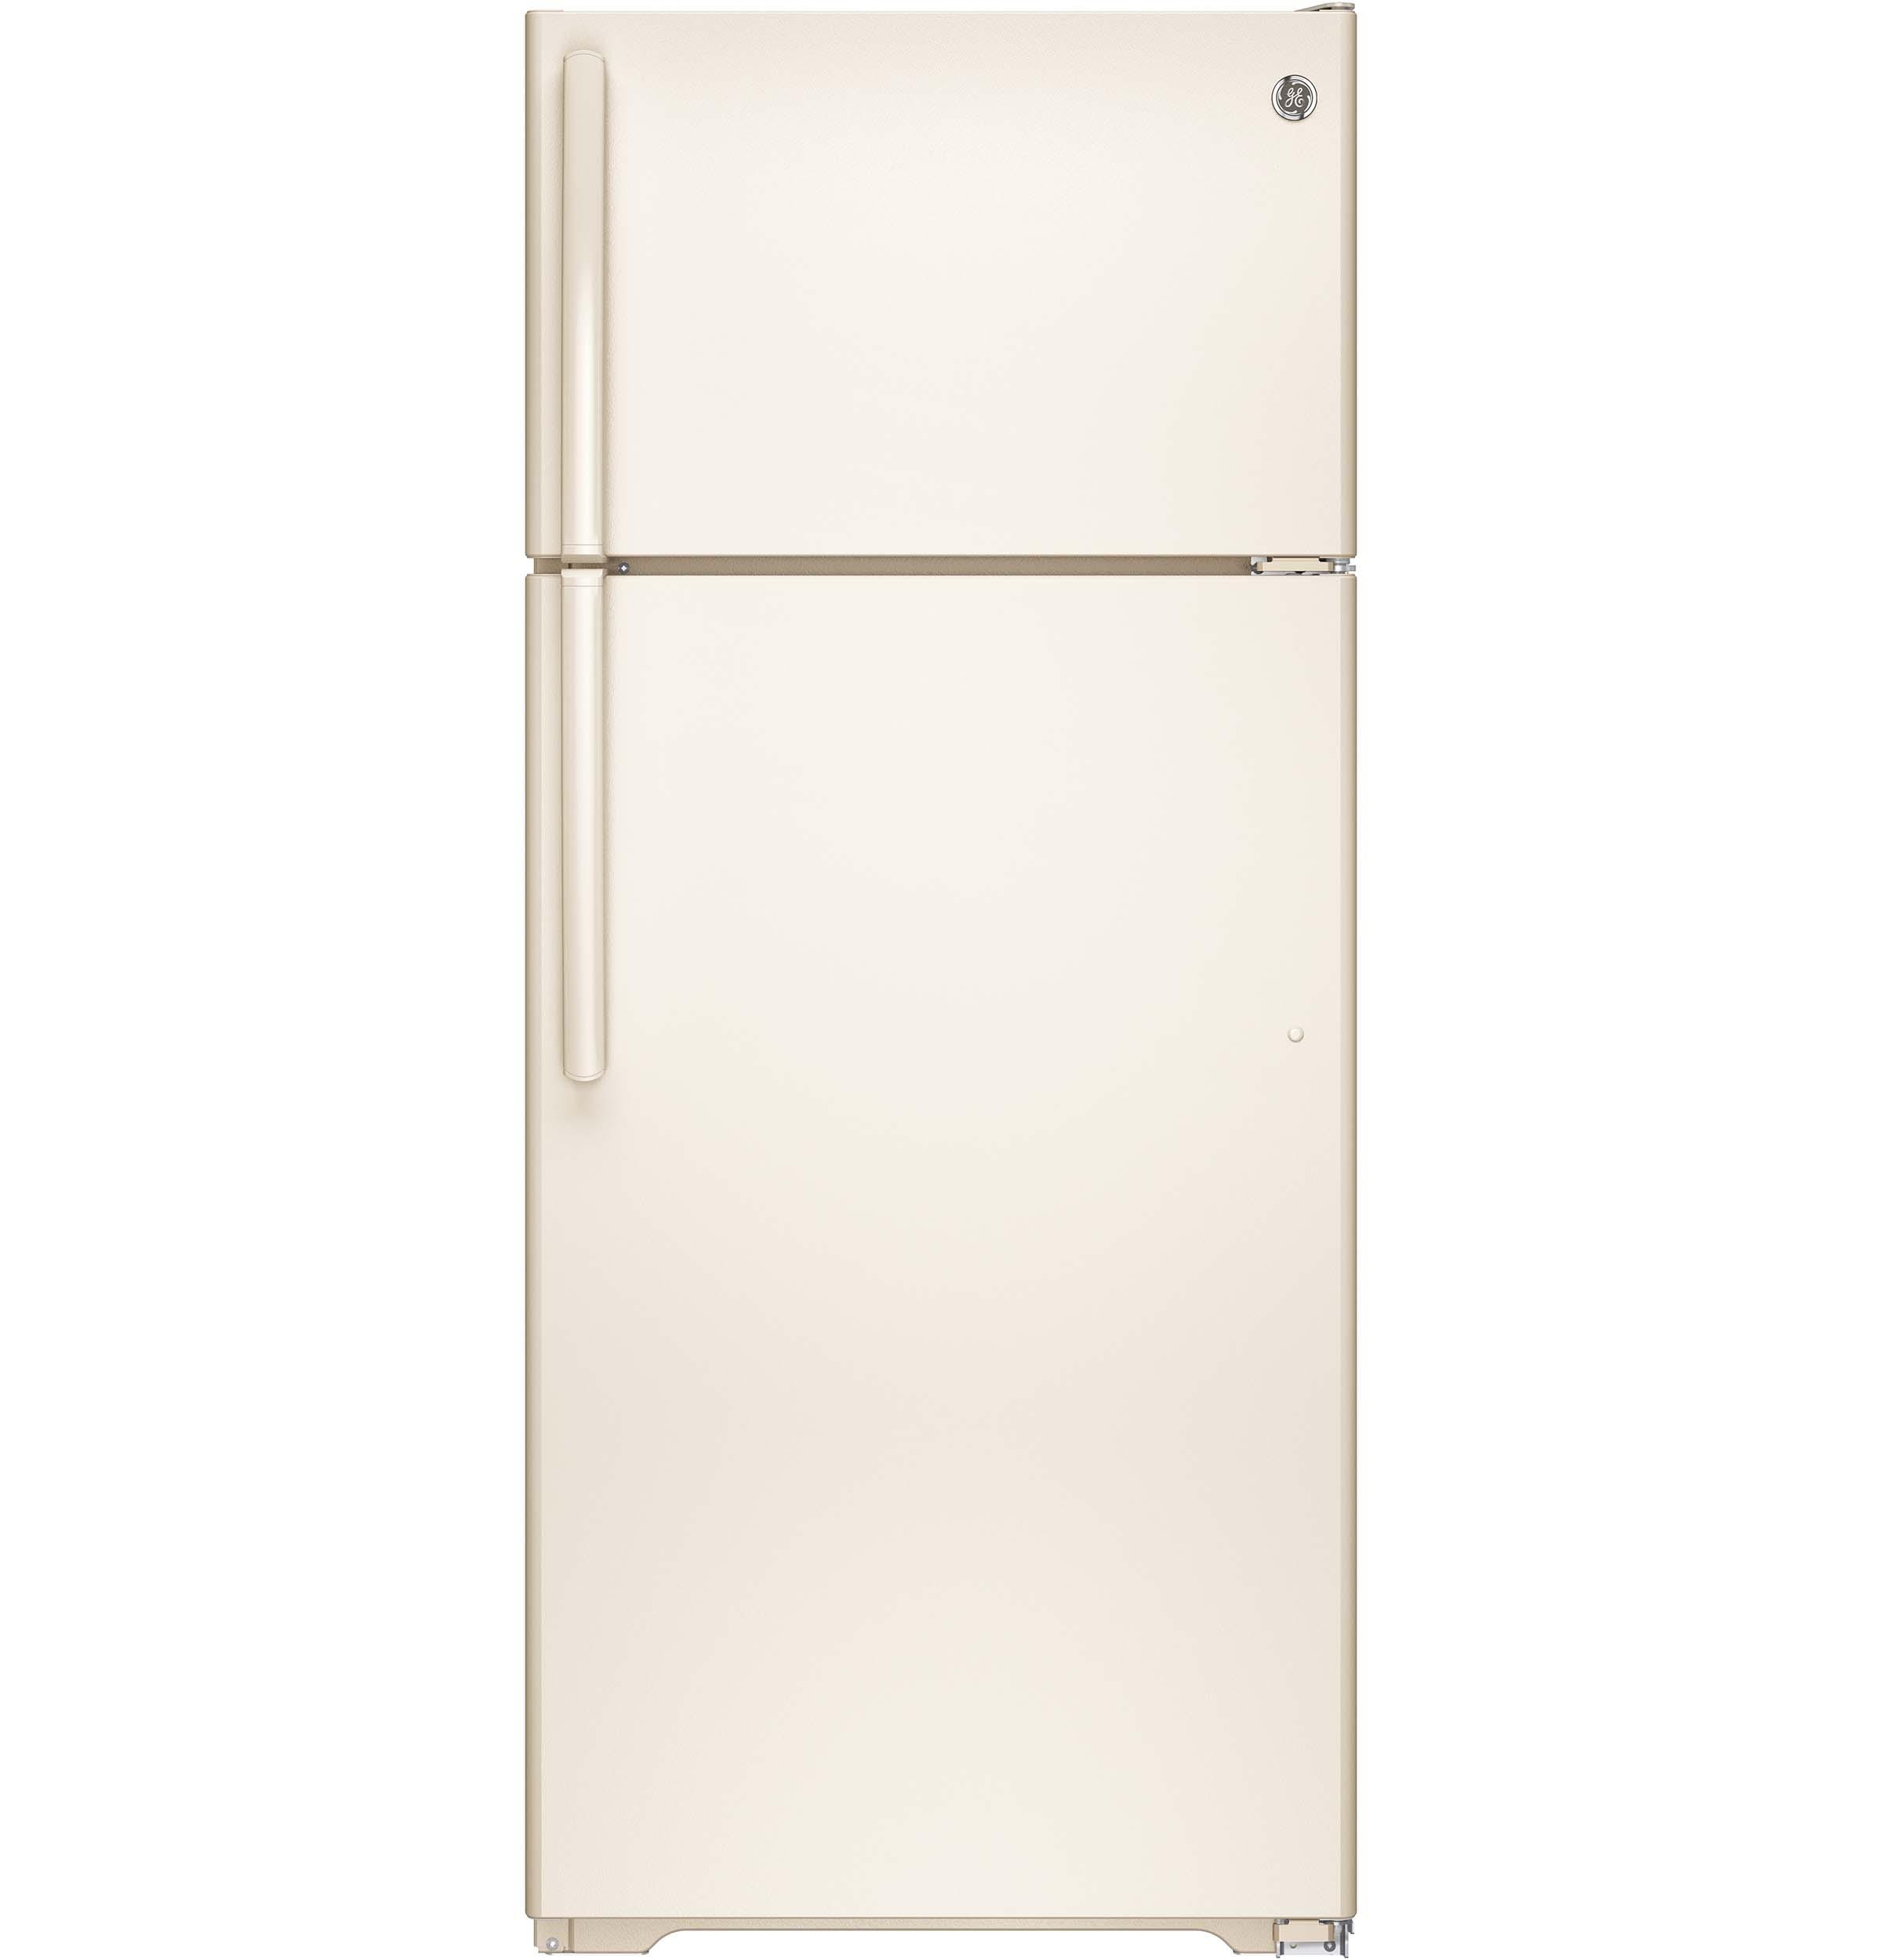 GE GE® ENERGY STAR® 17.5 Cu. Ft. Top-Freezer Refrigerator